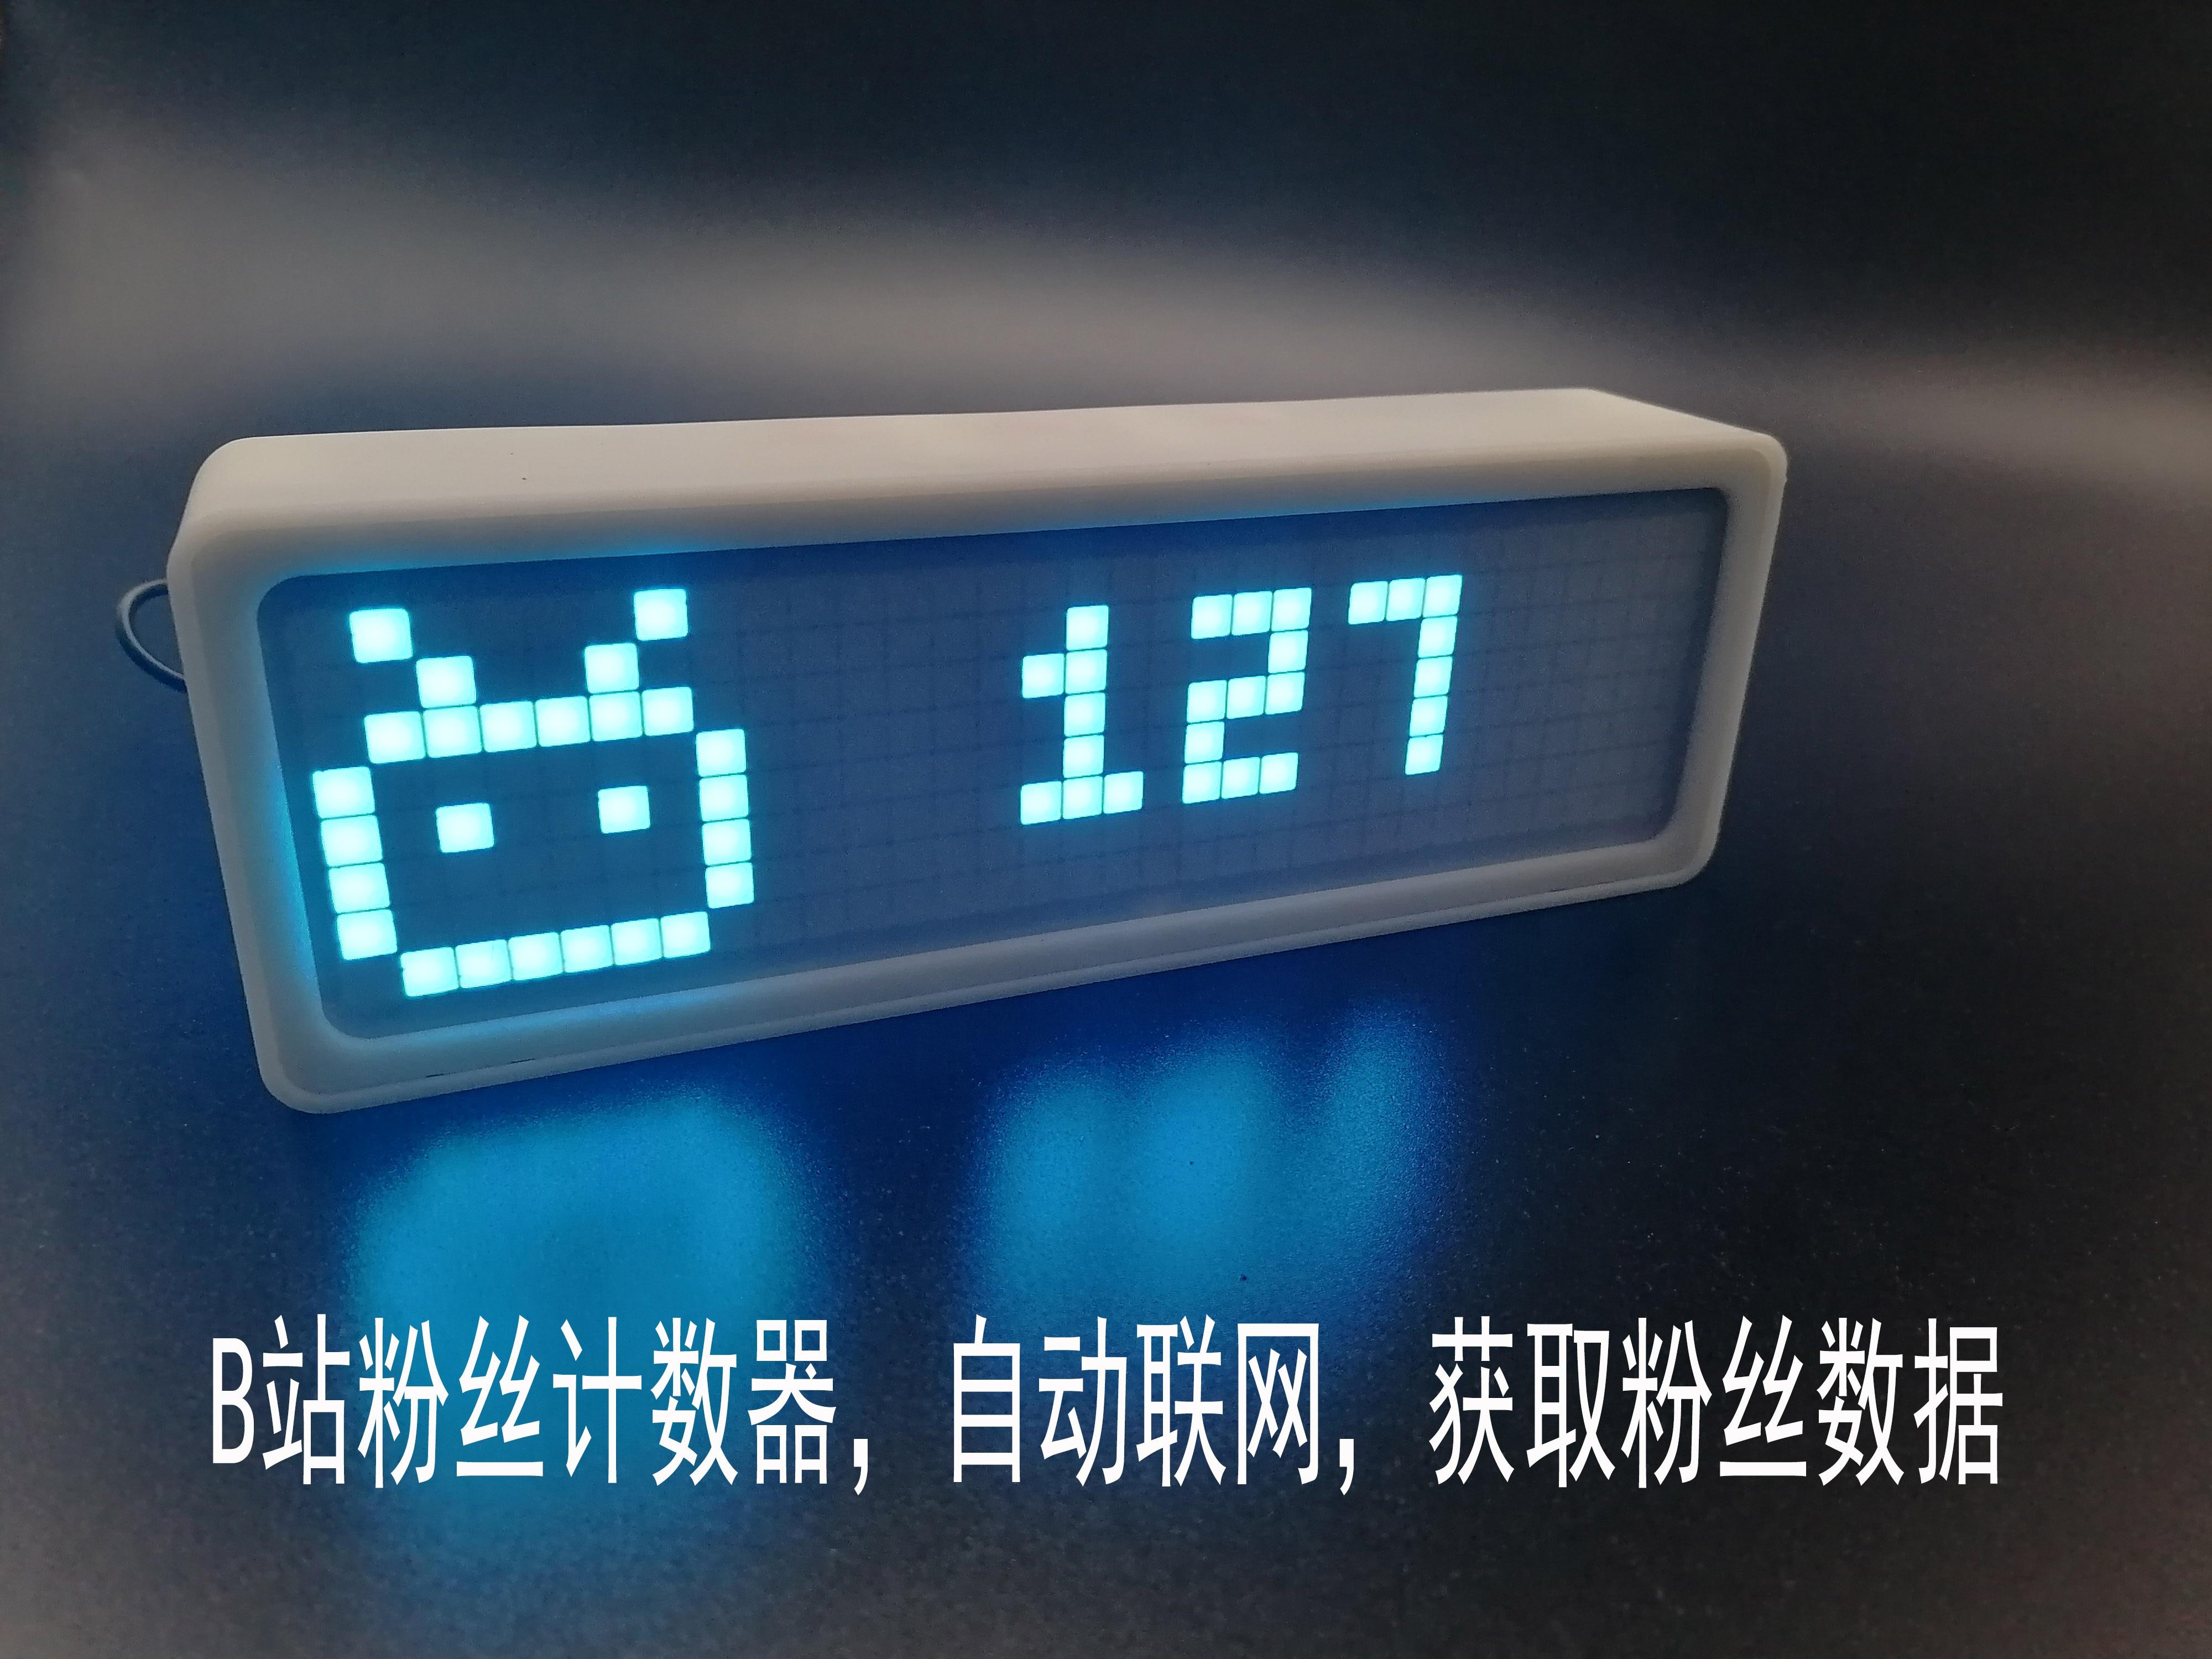 AWTRIX بكسل شاشة ديجيتال صغيرة اللون شاشة واي فاي شبكة B محطة المشجعين عدد بيتكوين وقت الطقس السوق